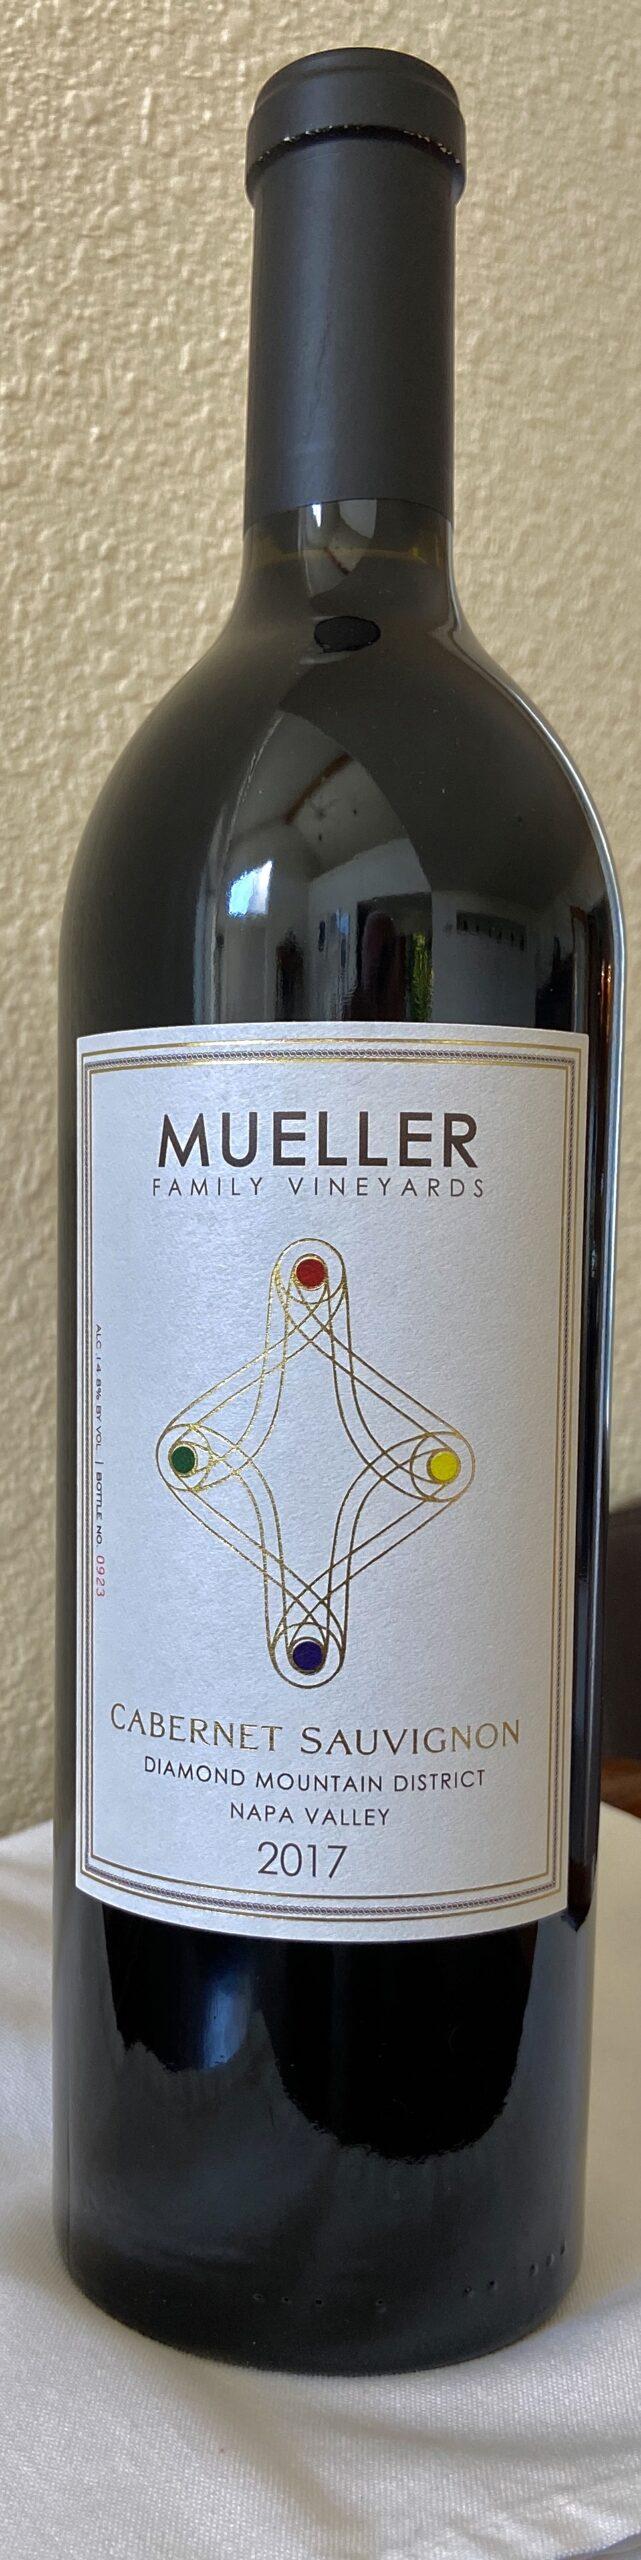 Mueller Family Vineyards 2017 Cabernet Sauvignon